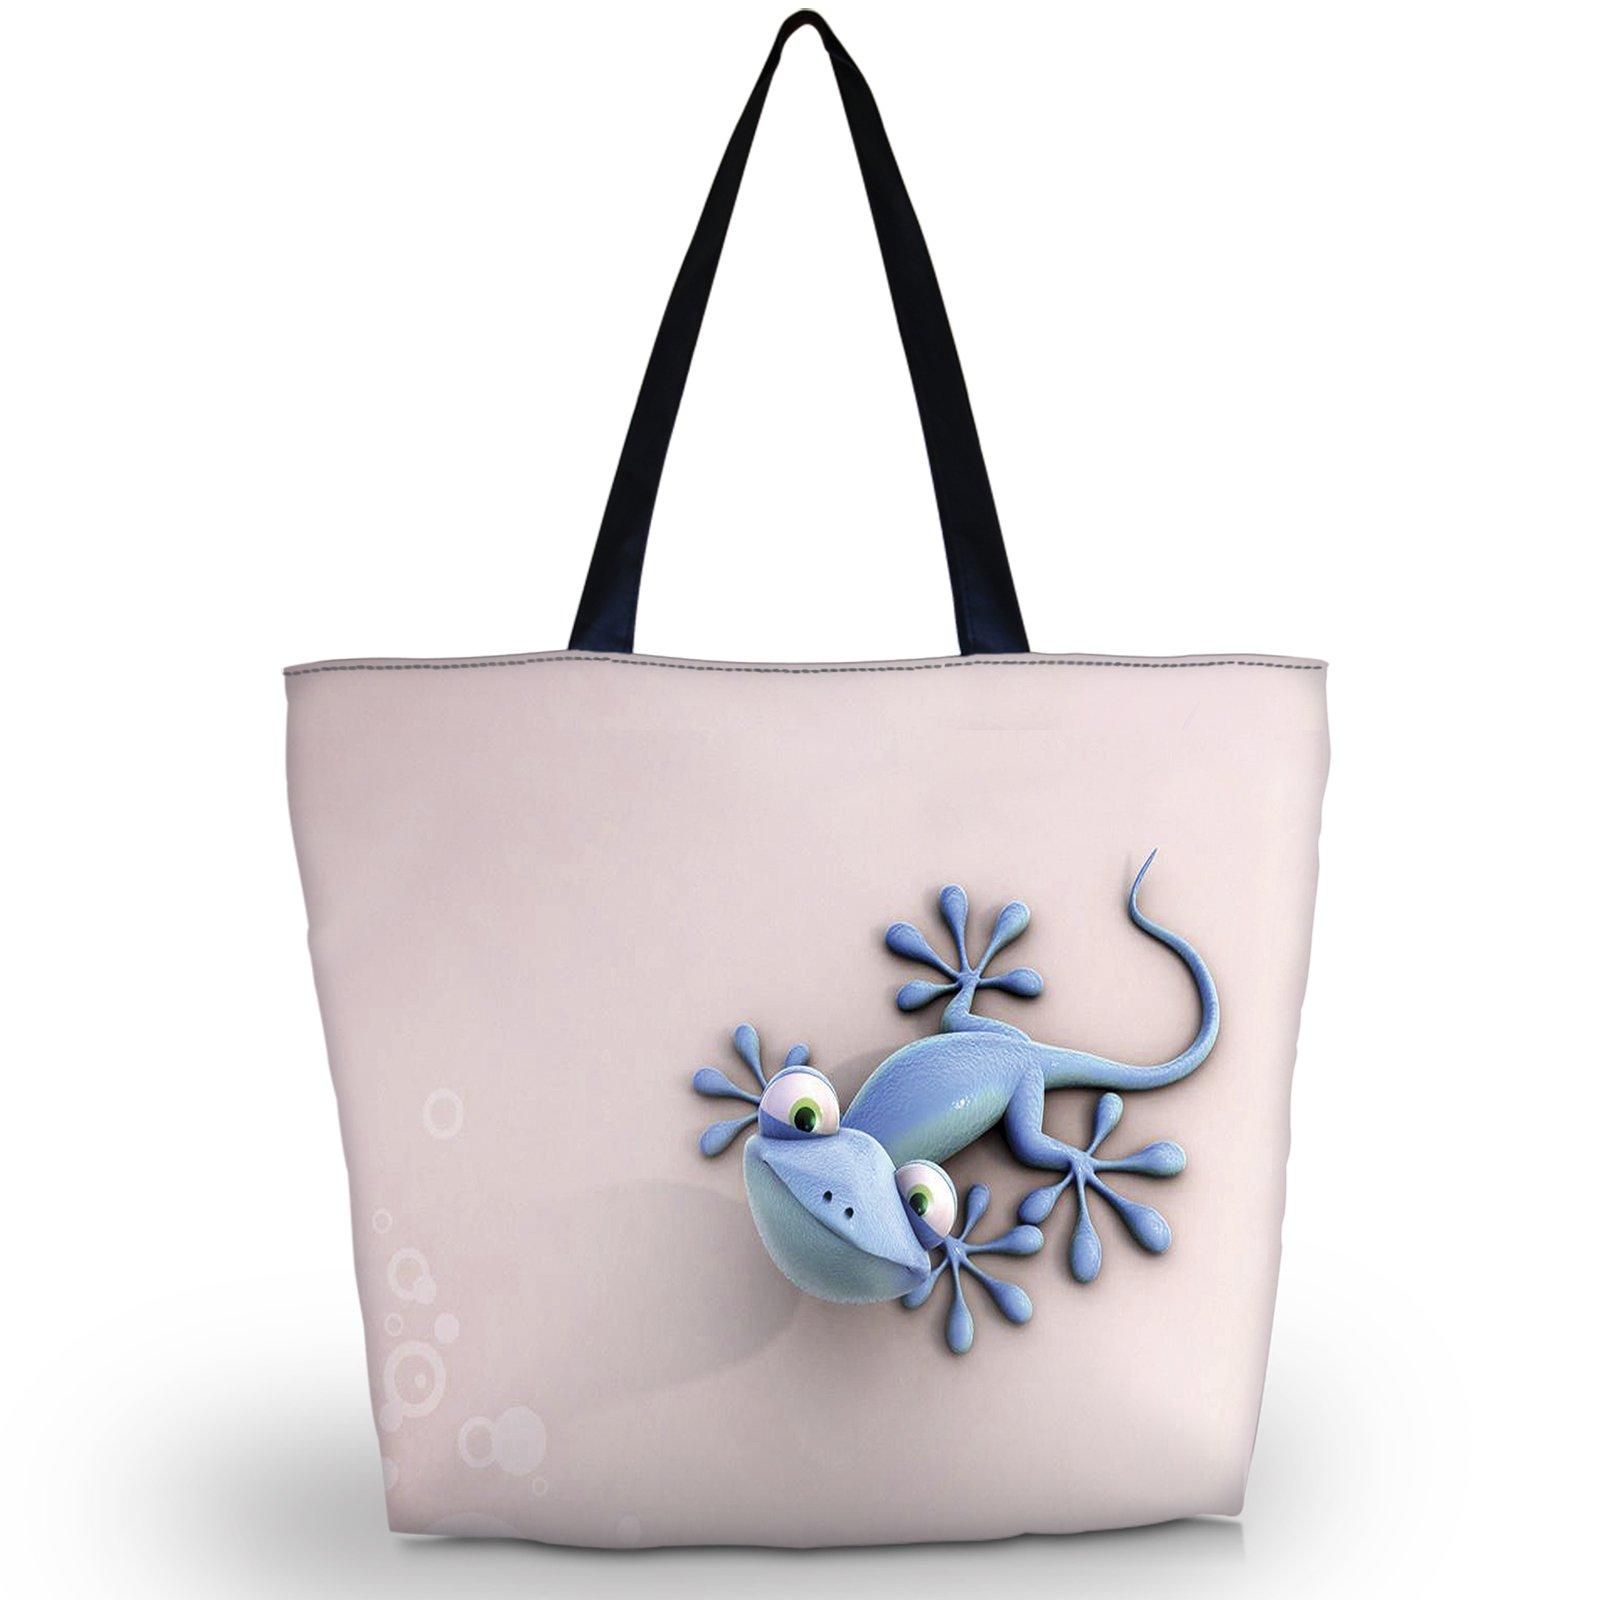 Newplenty Ladies Zippered Light Shoulder Shopping Tote Bag Handbag Beach Satchel (SB-6006) by newplenty (Image #1)